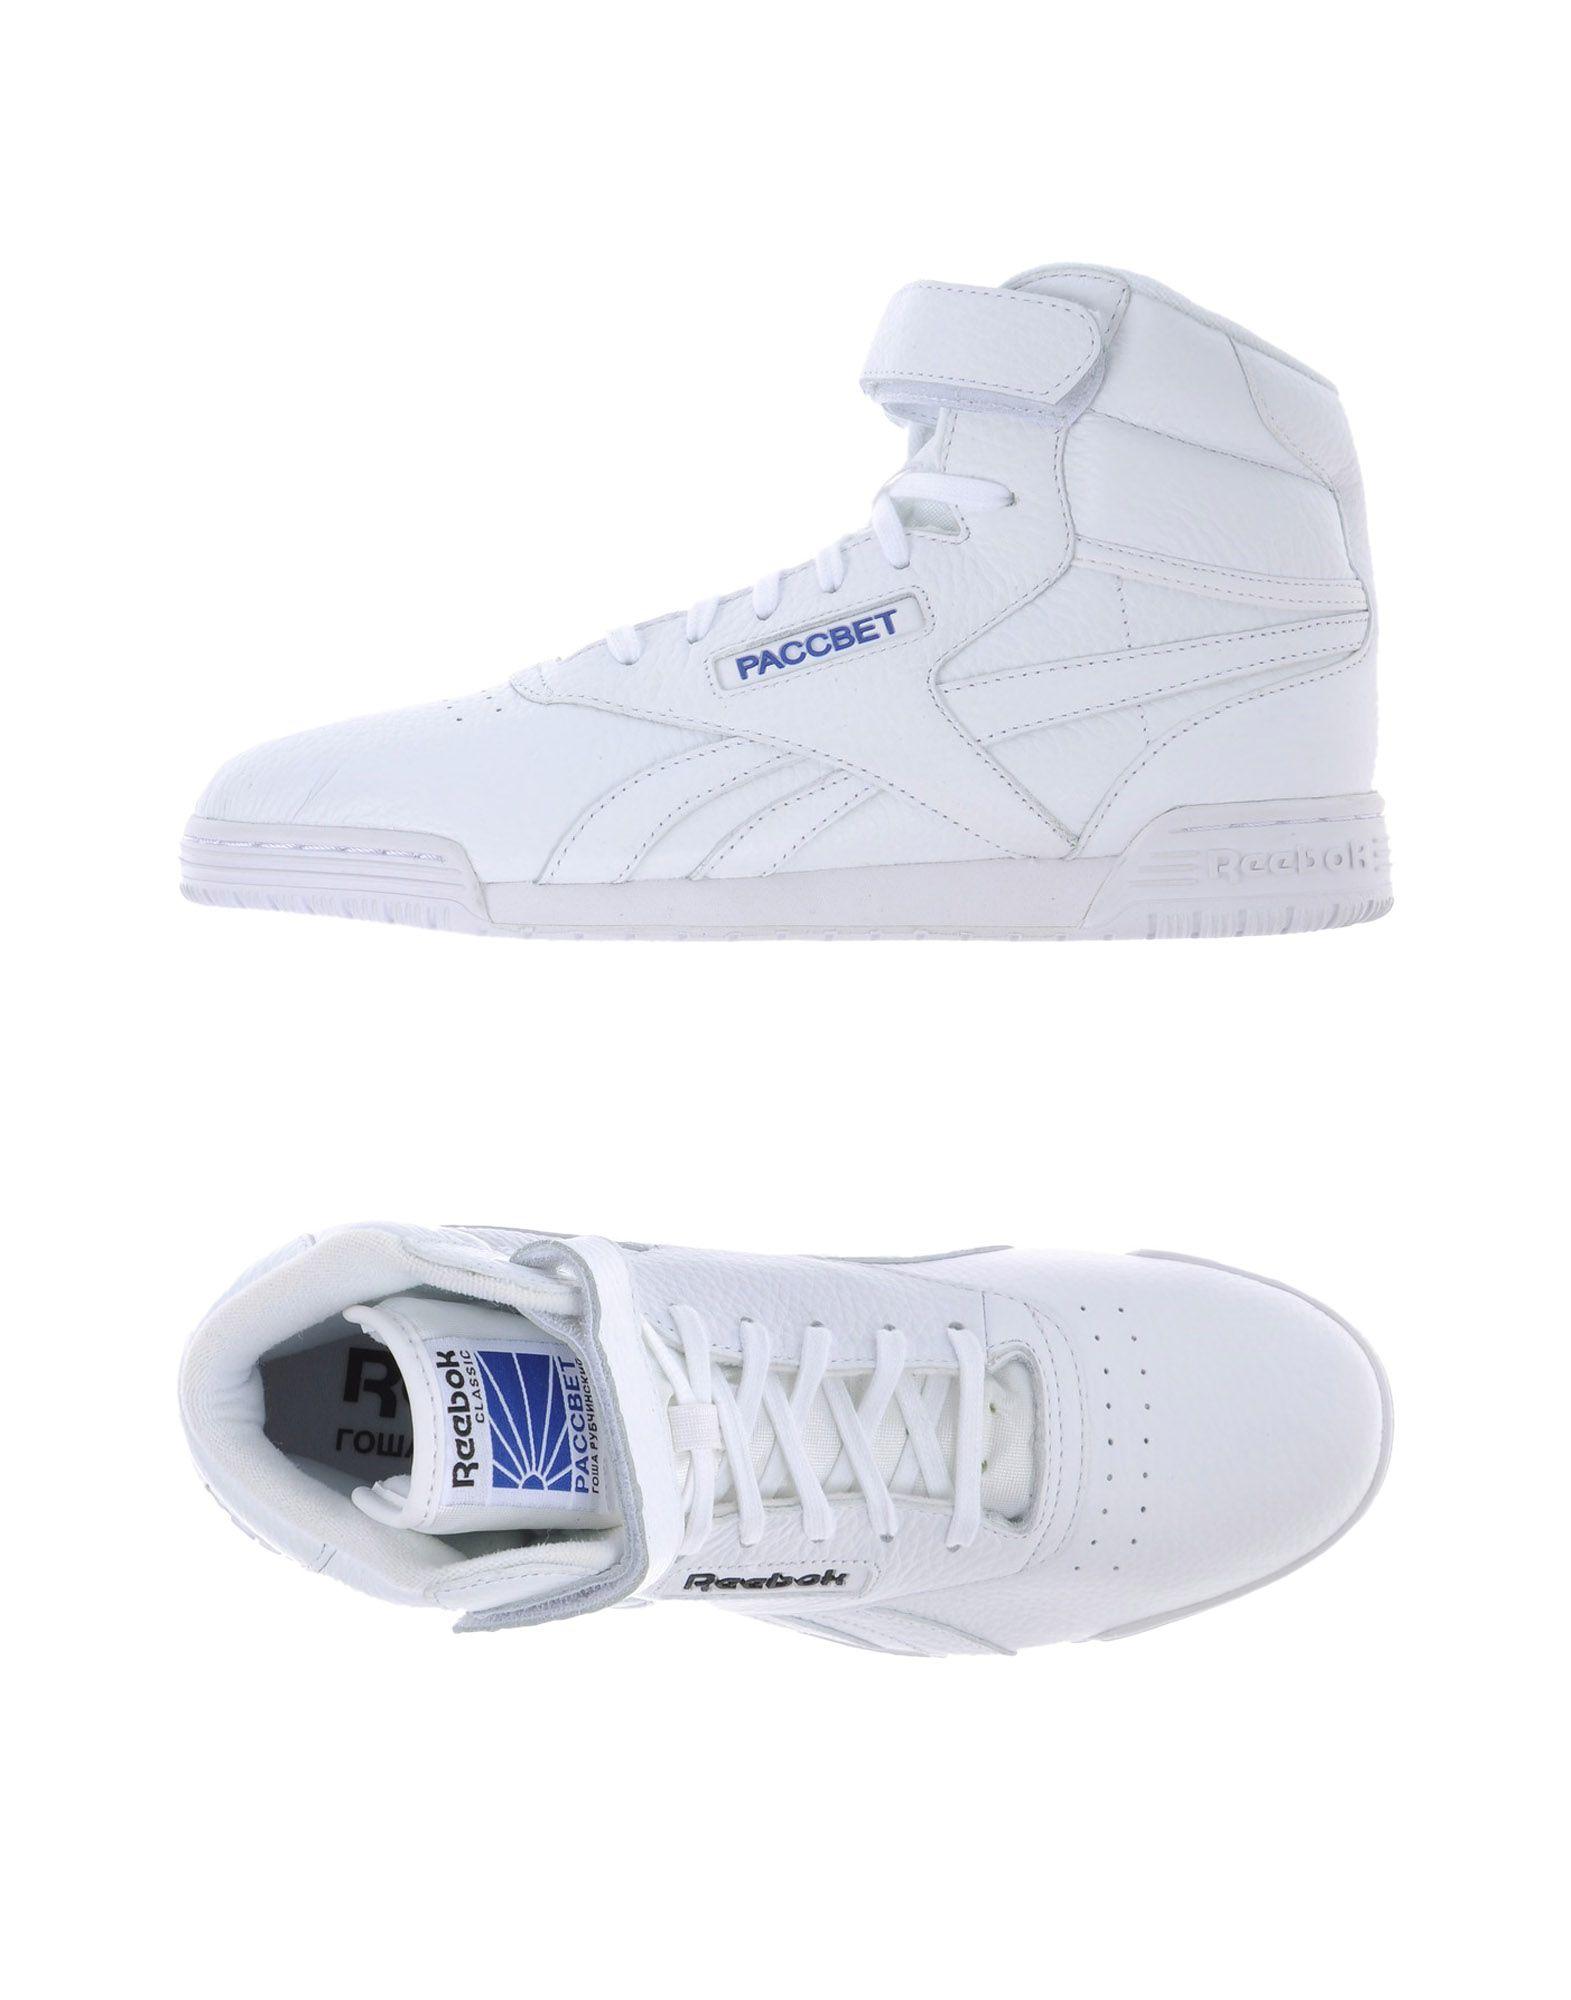 Gosha Rubchinskiy Sneakers Herren  11241021DU Gute Qualität beliebte Schuhe